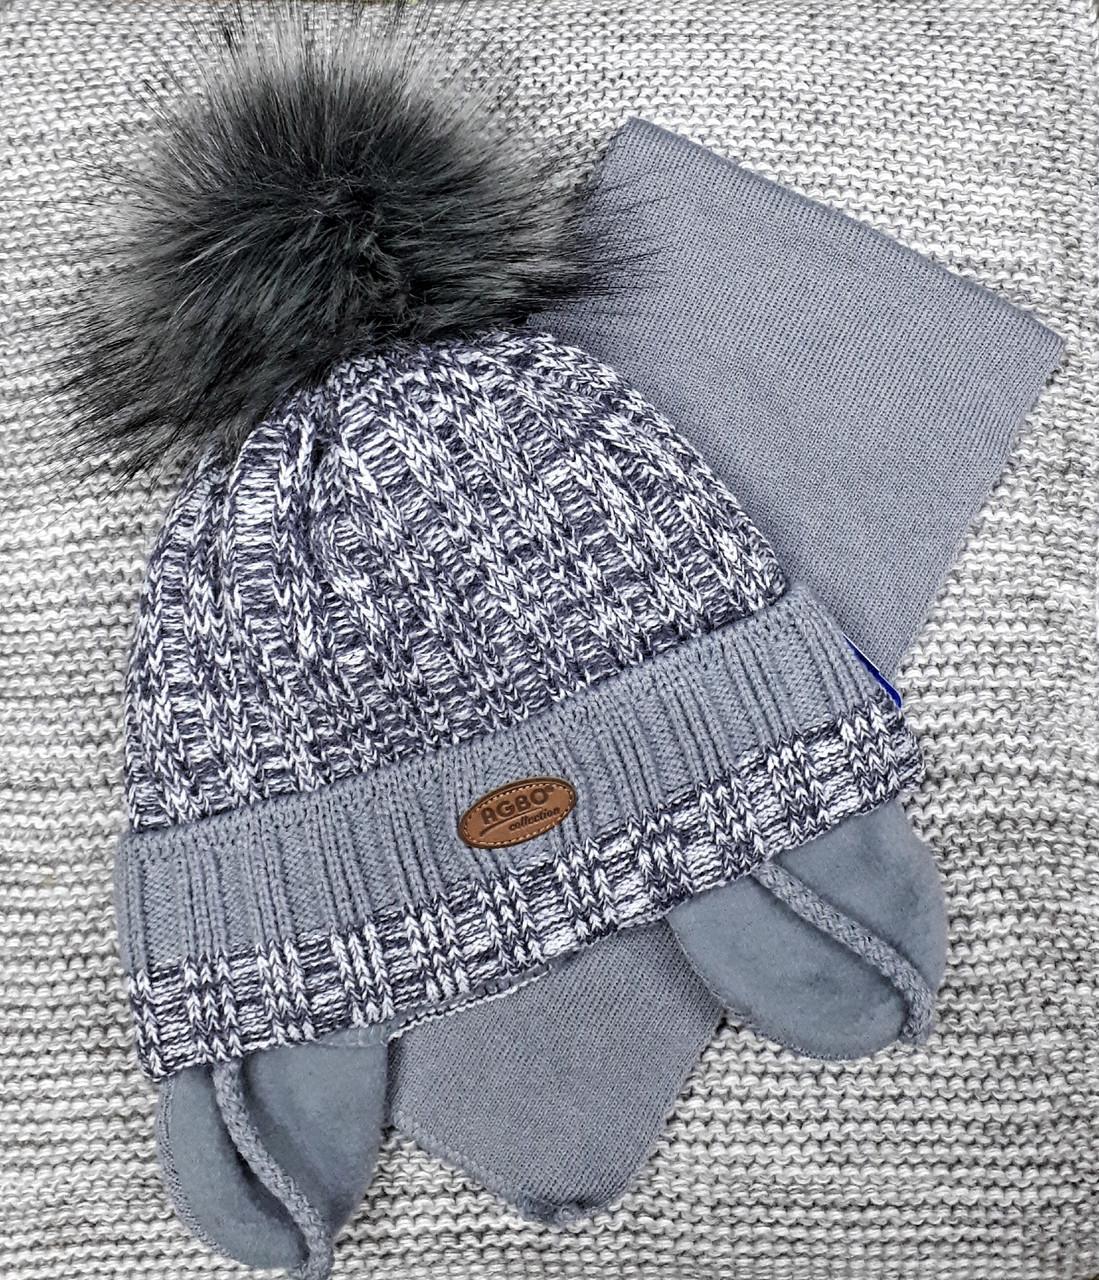 Шапка с шарфом детская  на мальчика зима серый меланж AGBO  (Польша) размер 48 50